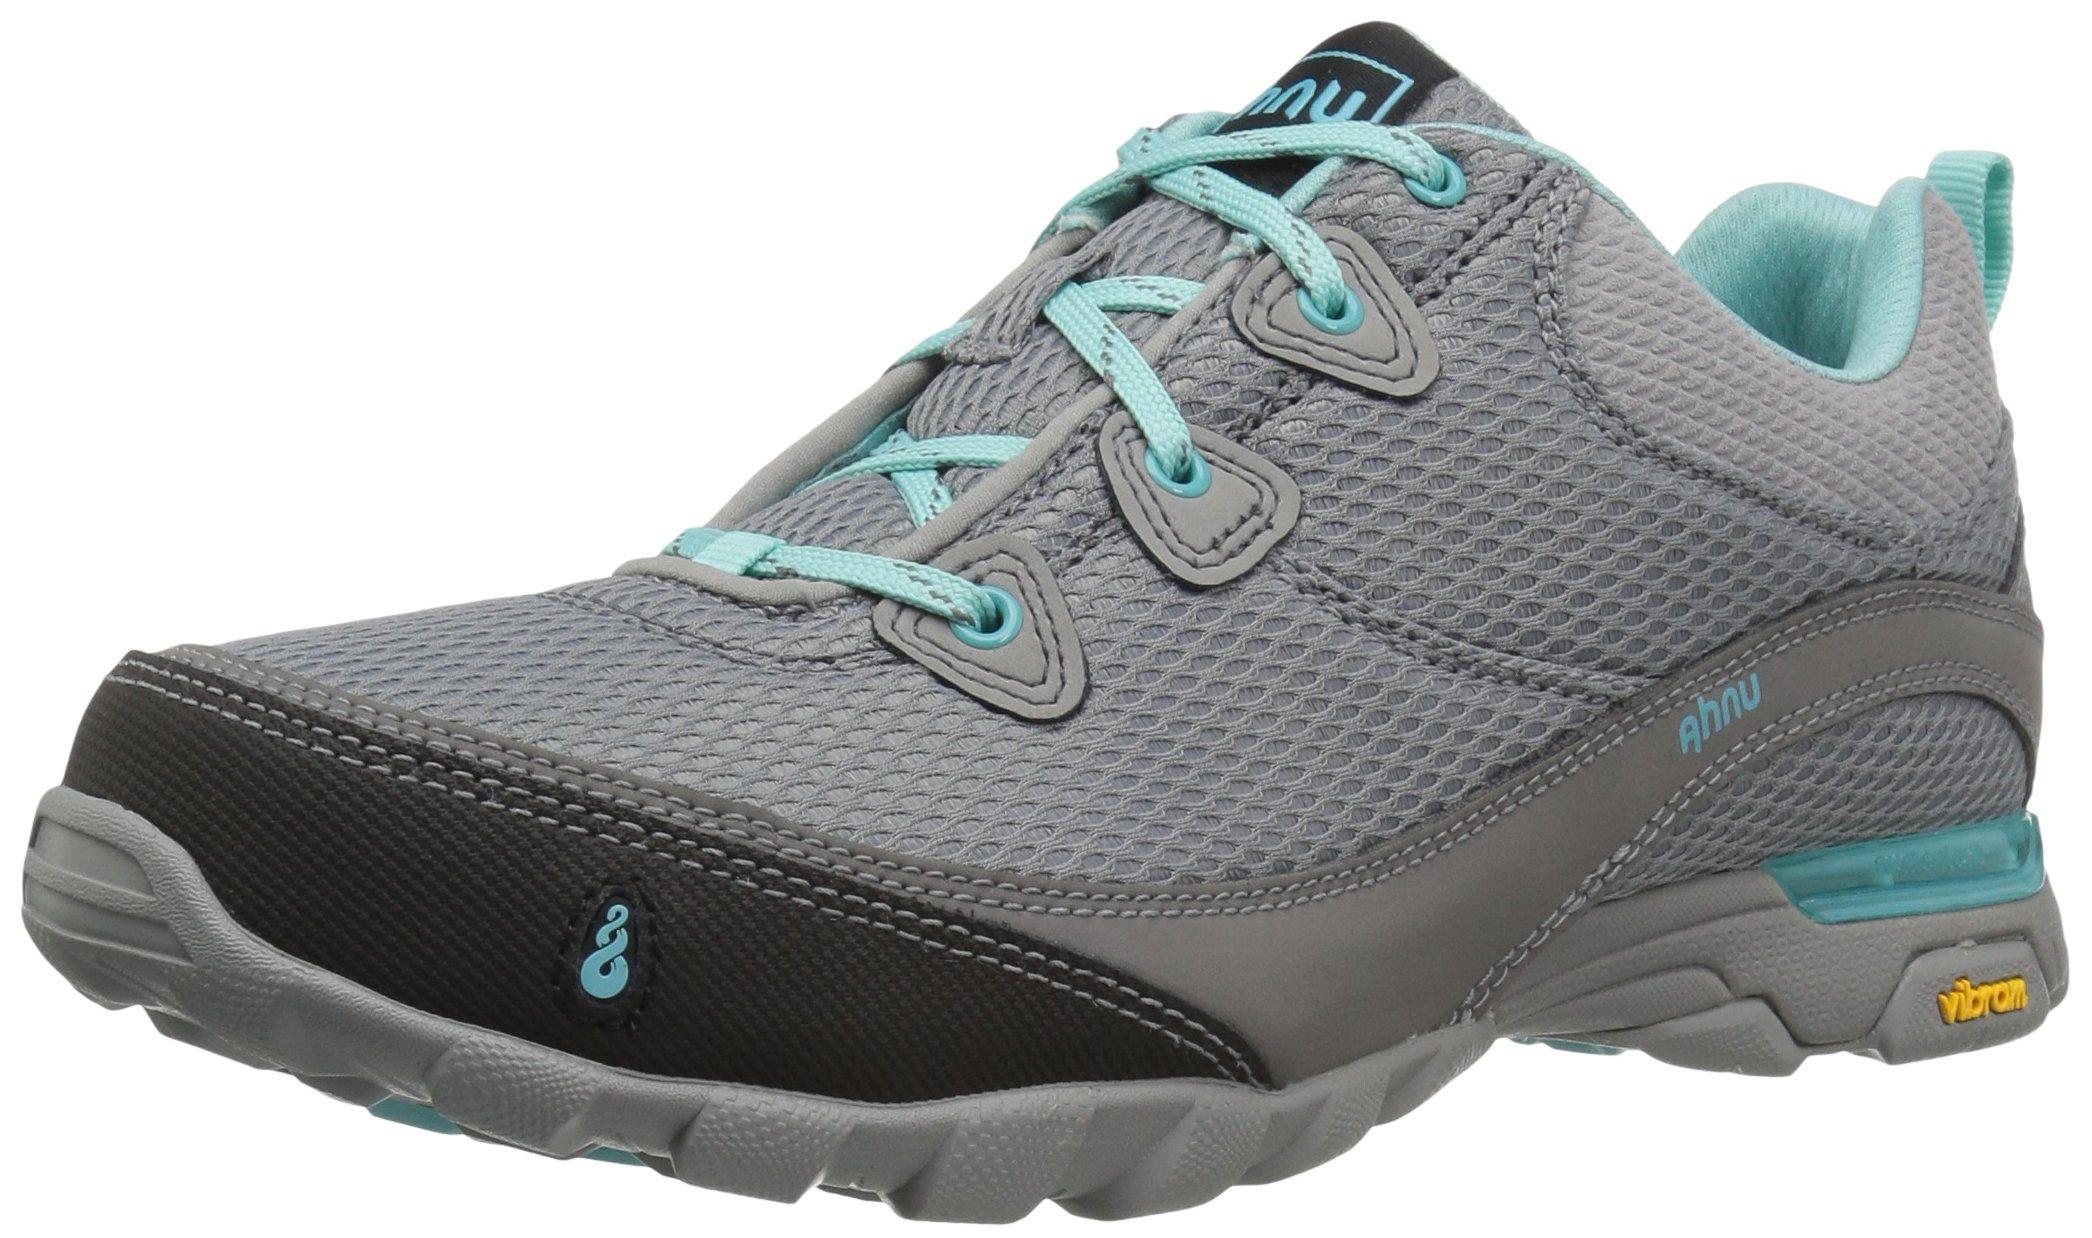 Ahnu Women's W Sugarpine Air Mesh Hiking Shoe, Medium Grey, 6.5 M US